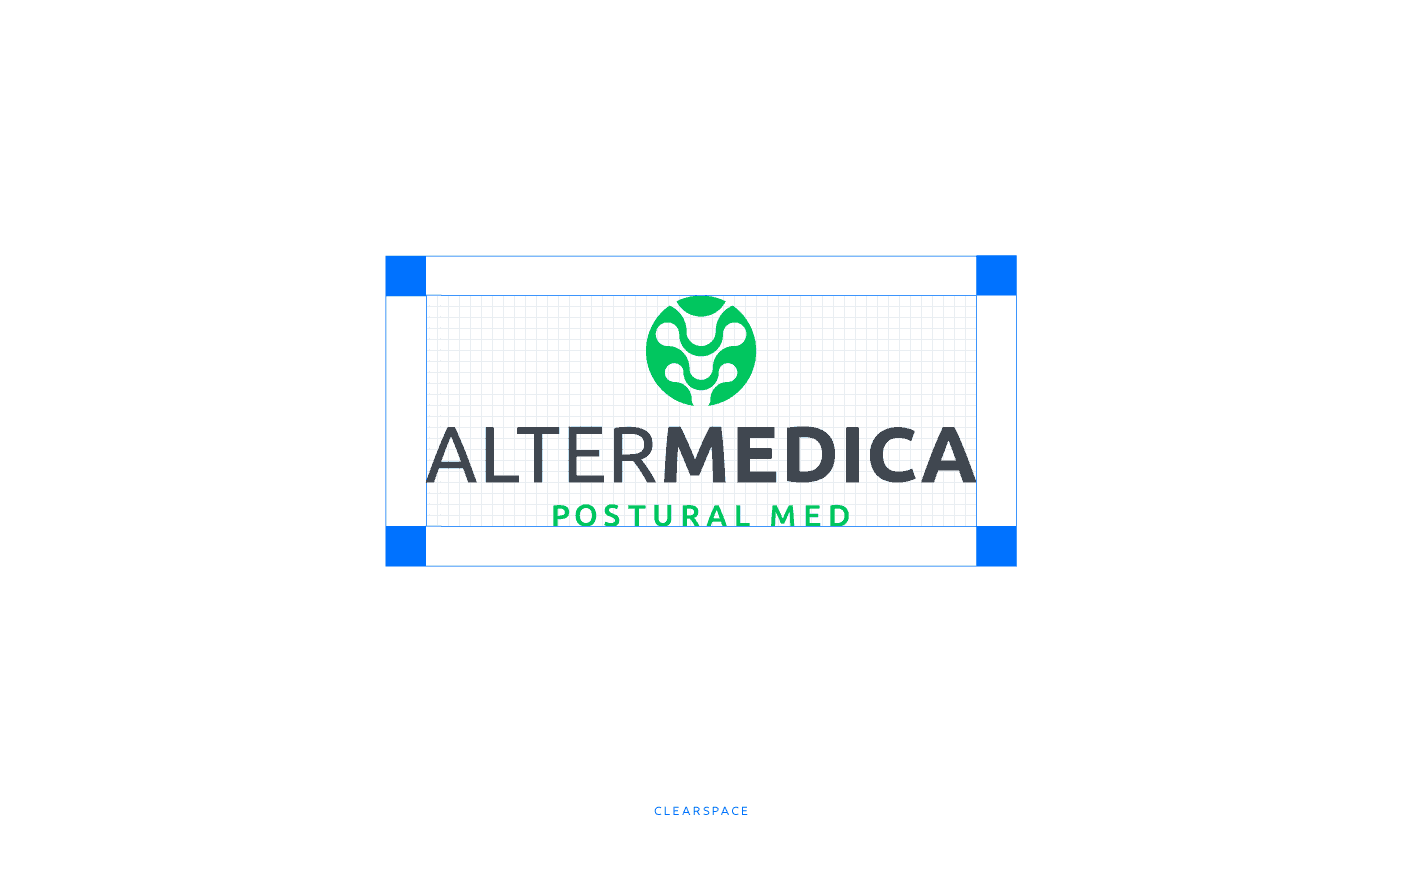 clinica posturologica Altermedica Roma